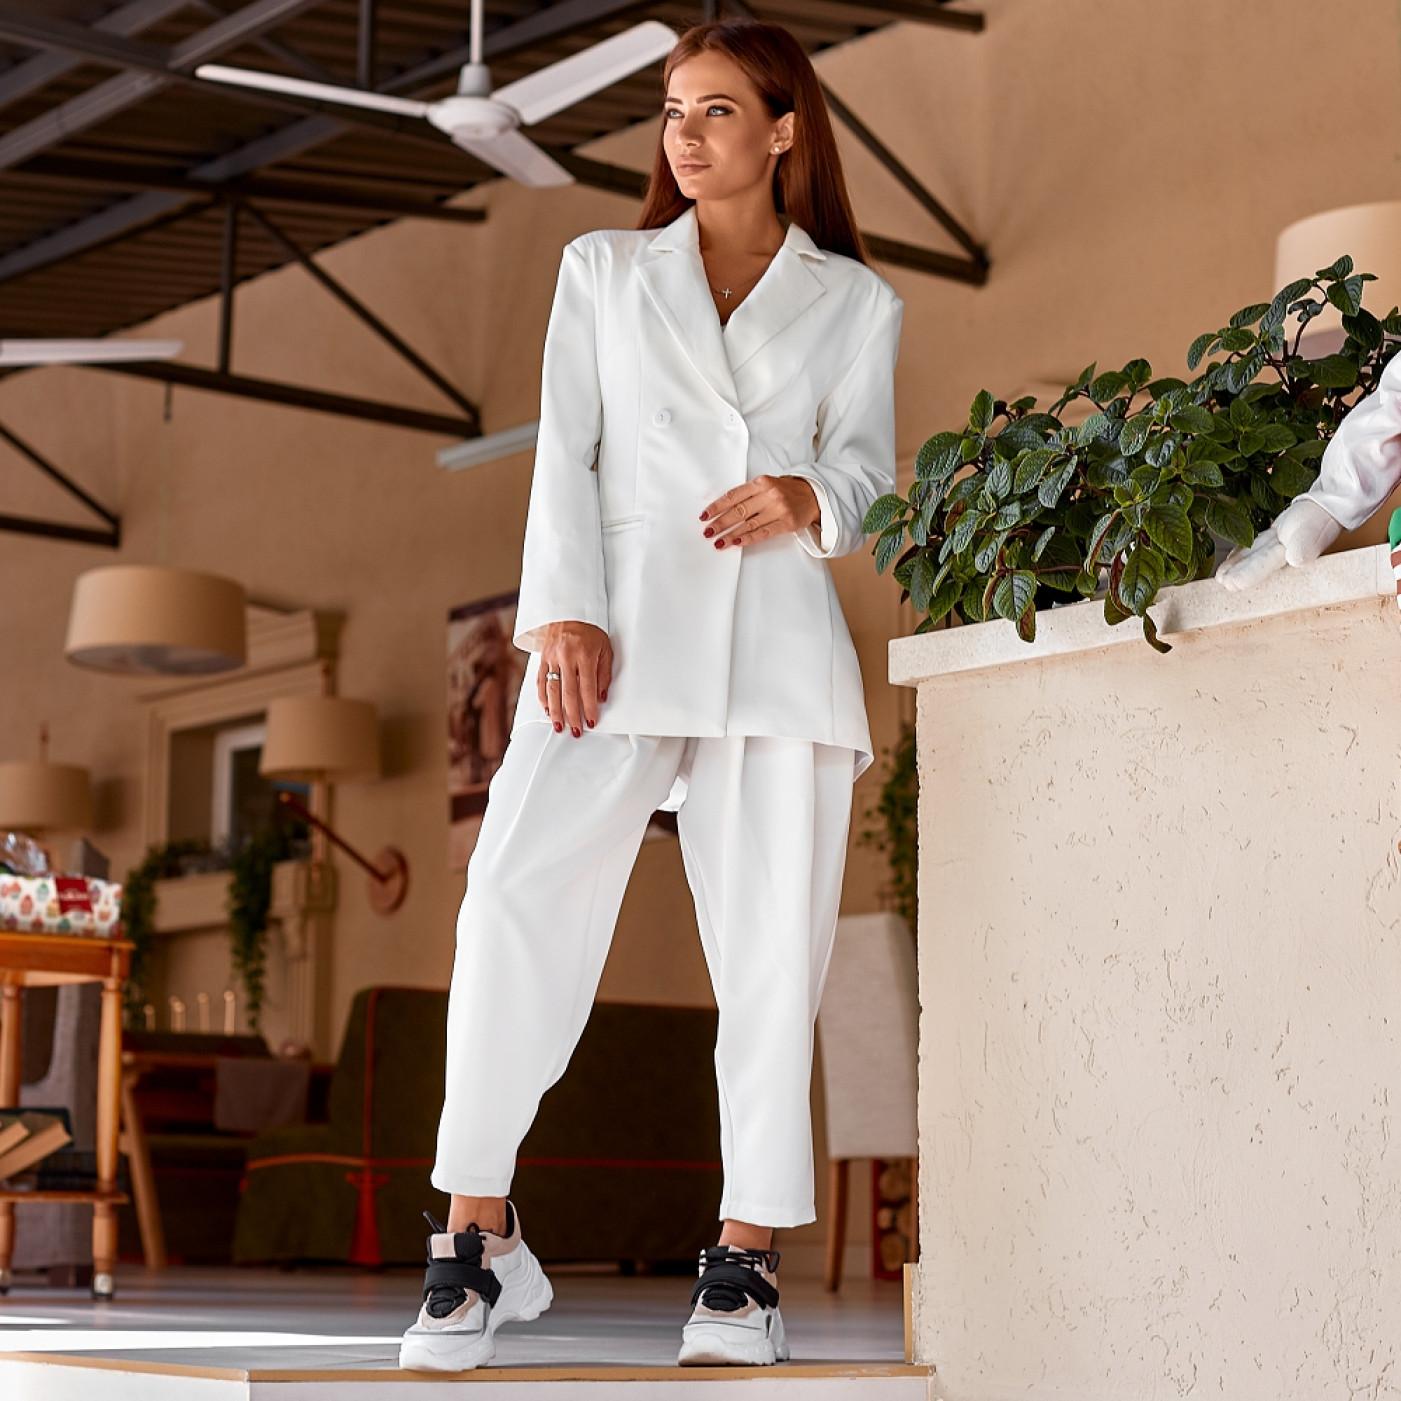 белый женский костюм с широкими брюками